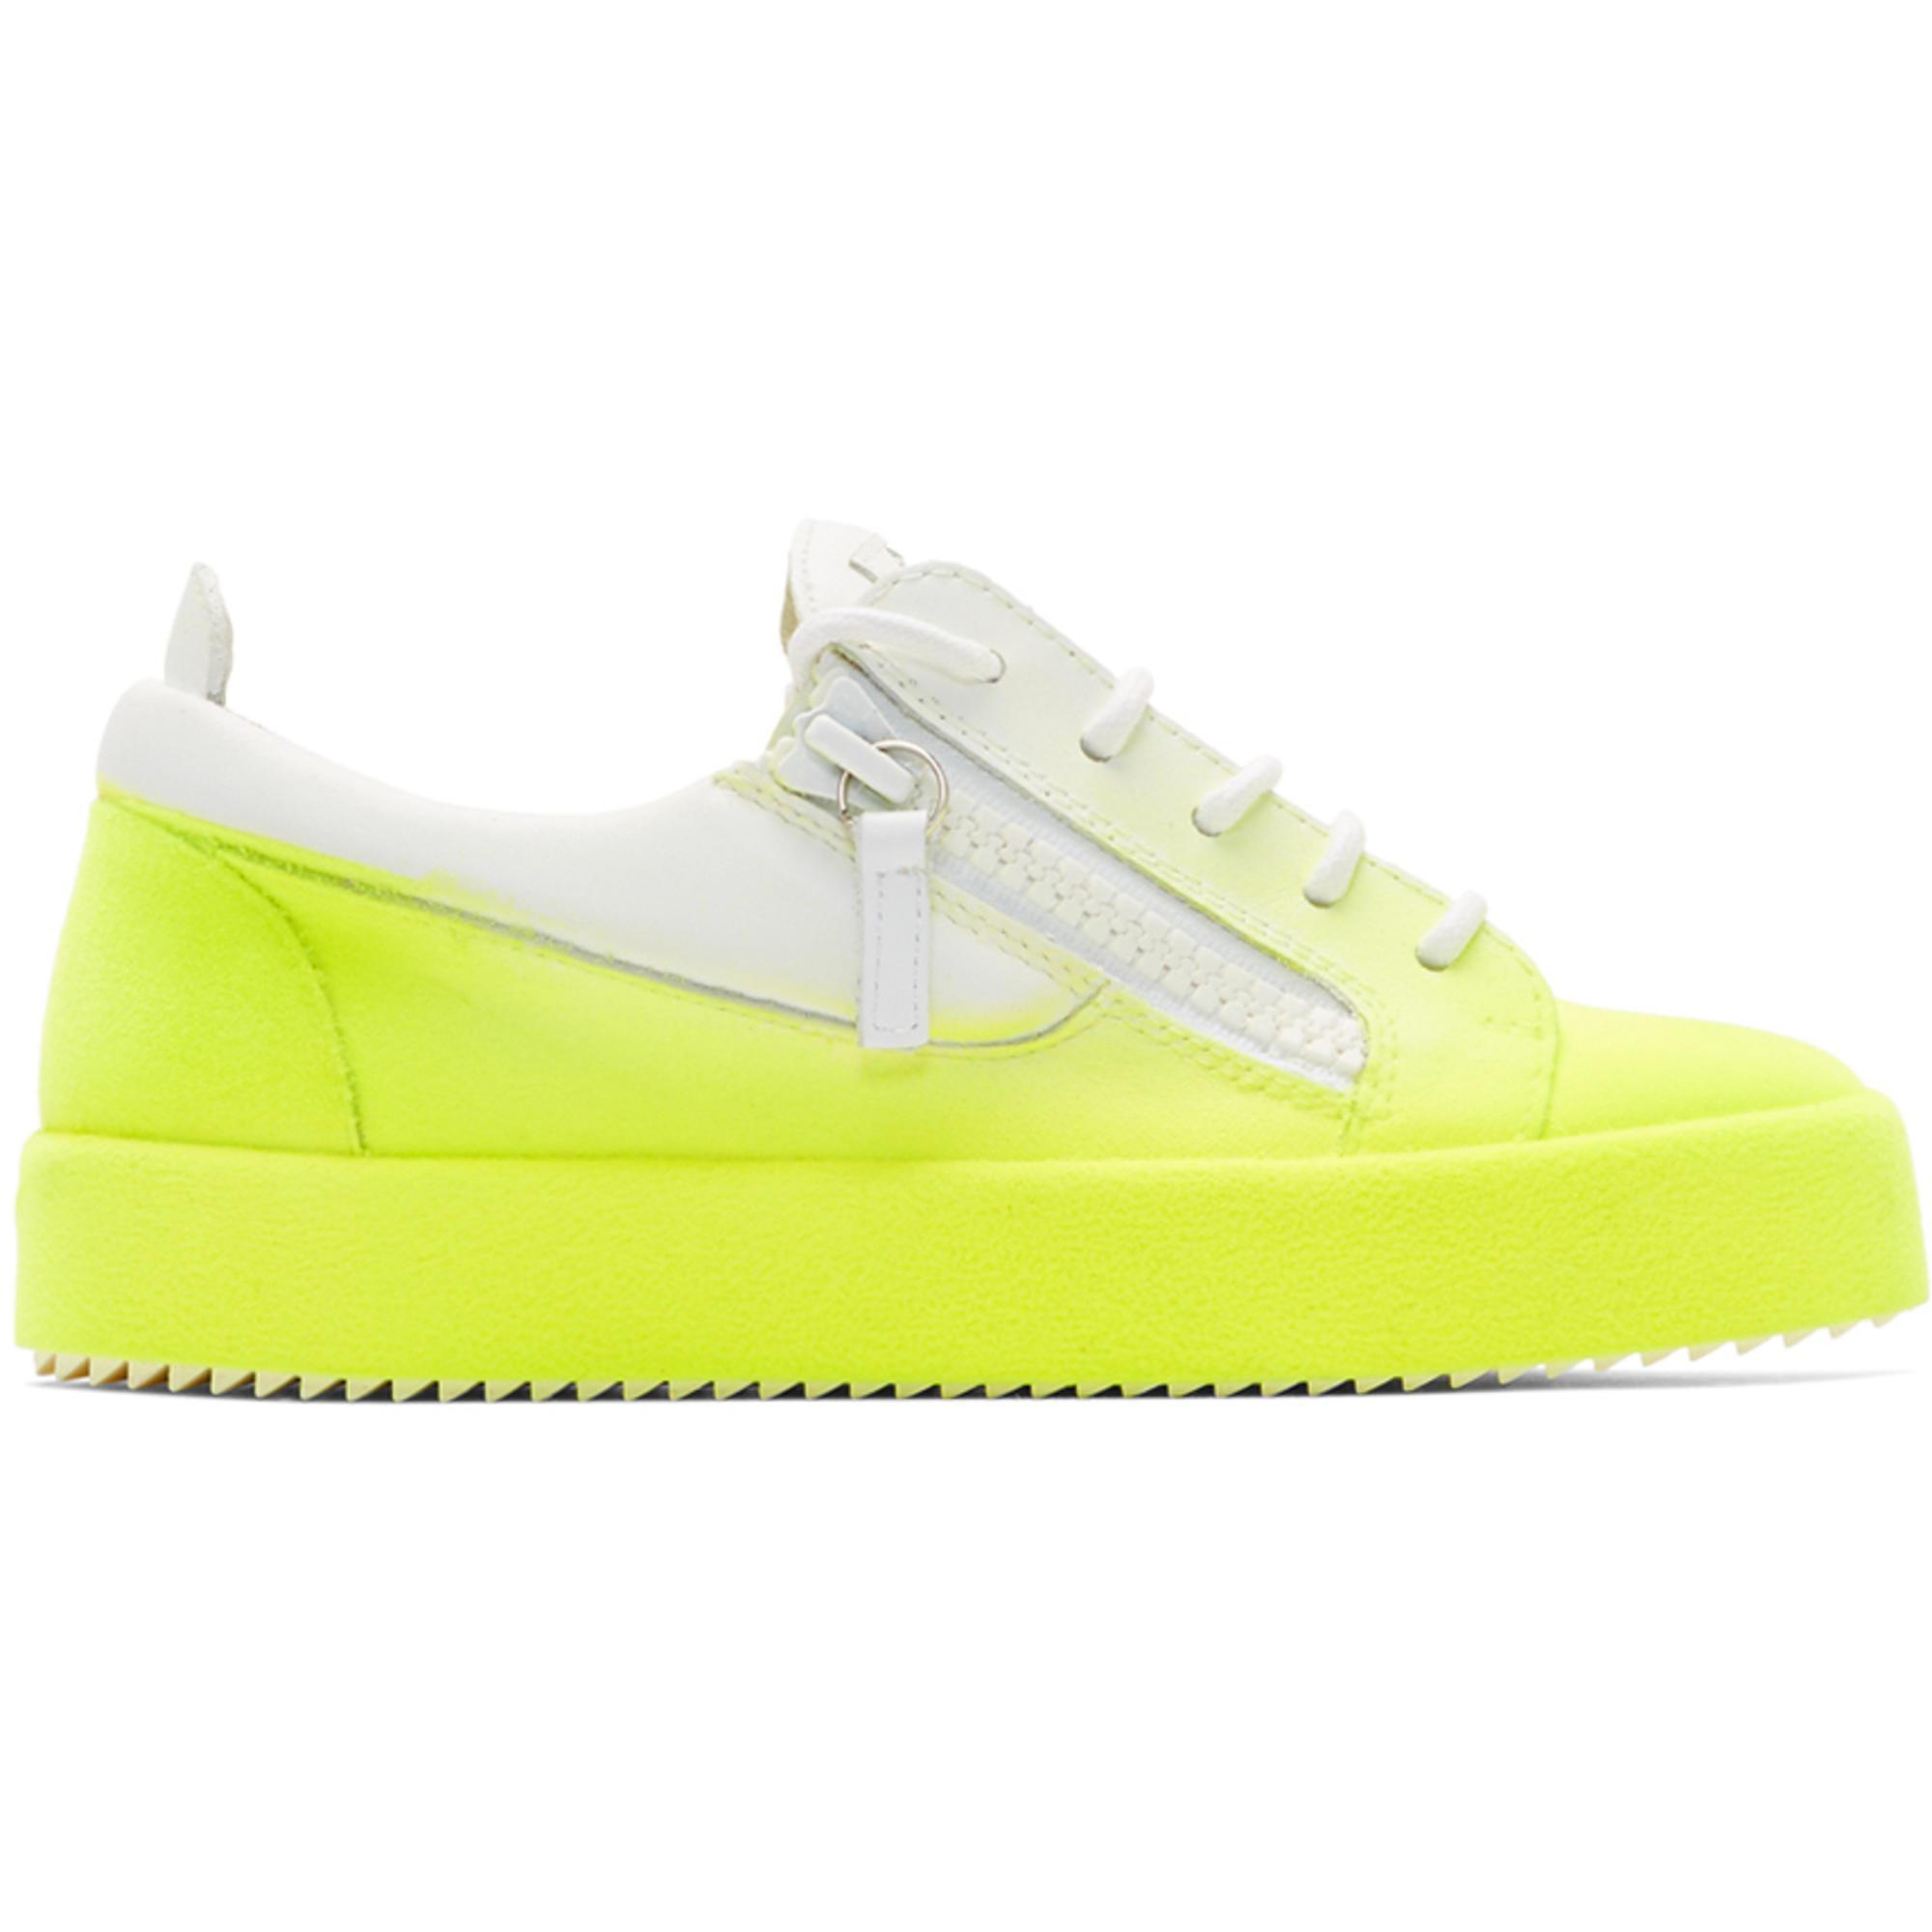 Giuseppe Zanotti & Flashy May London Sneakers QpUXB